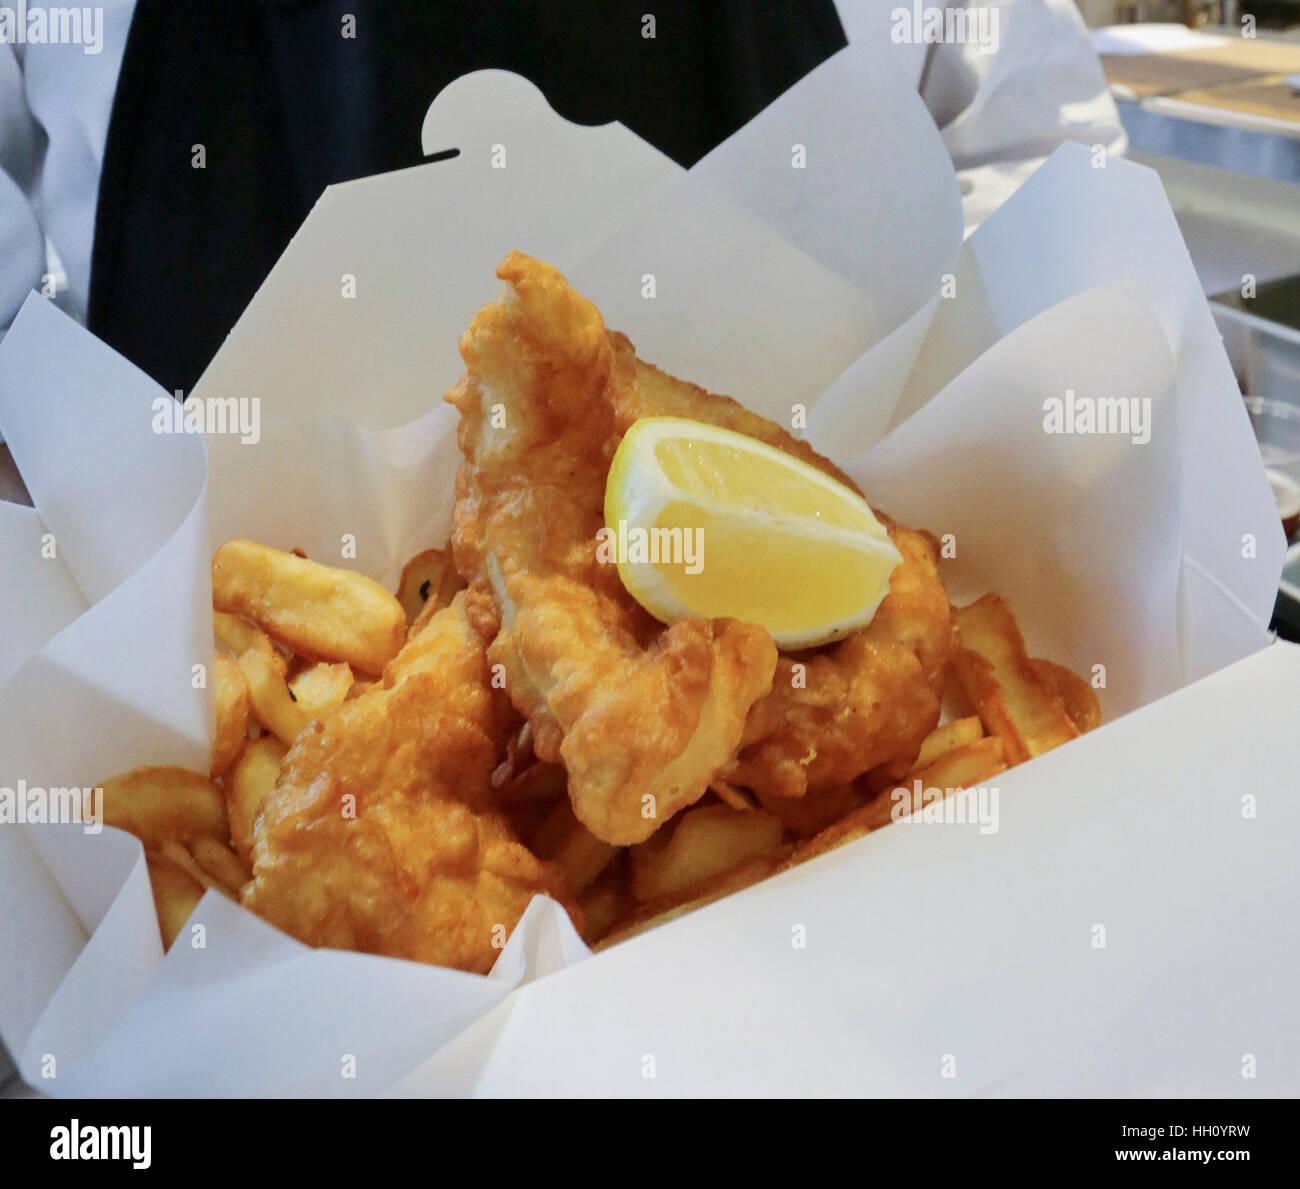 Fish and chips snack dans boîte en carton Photo Stock